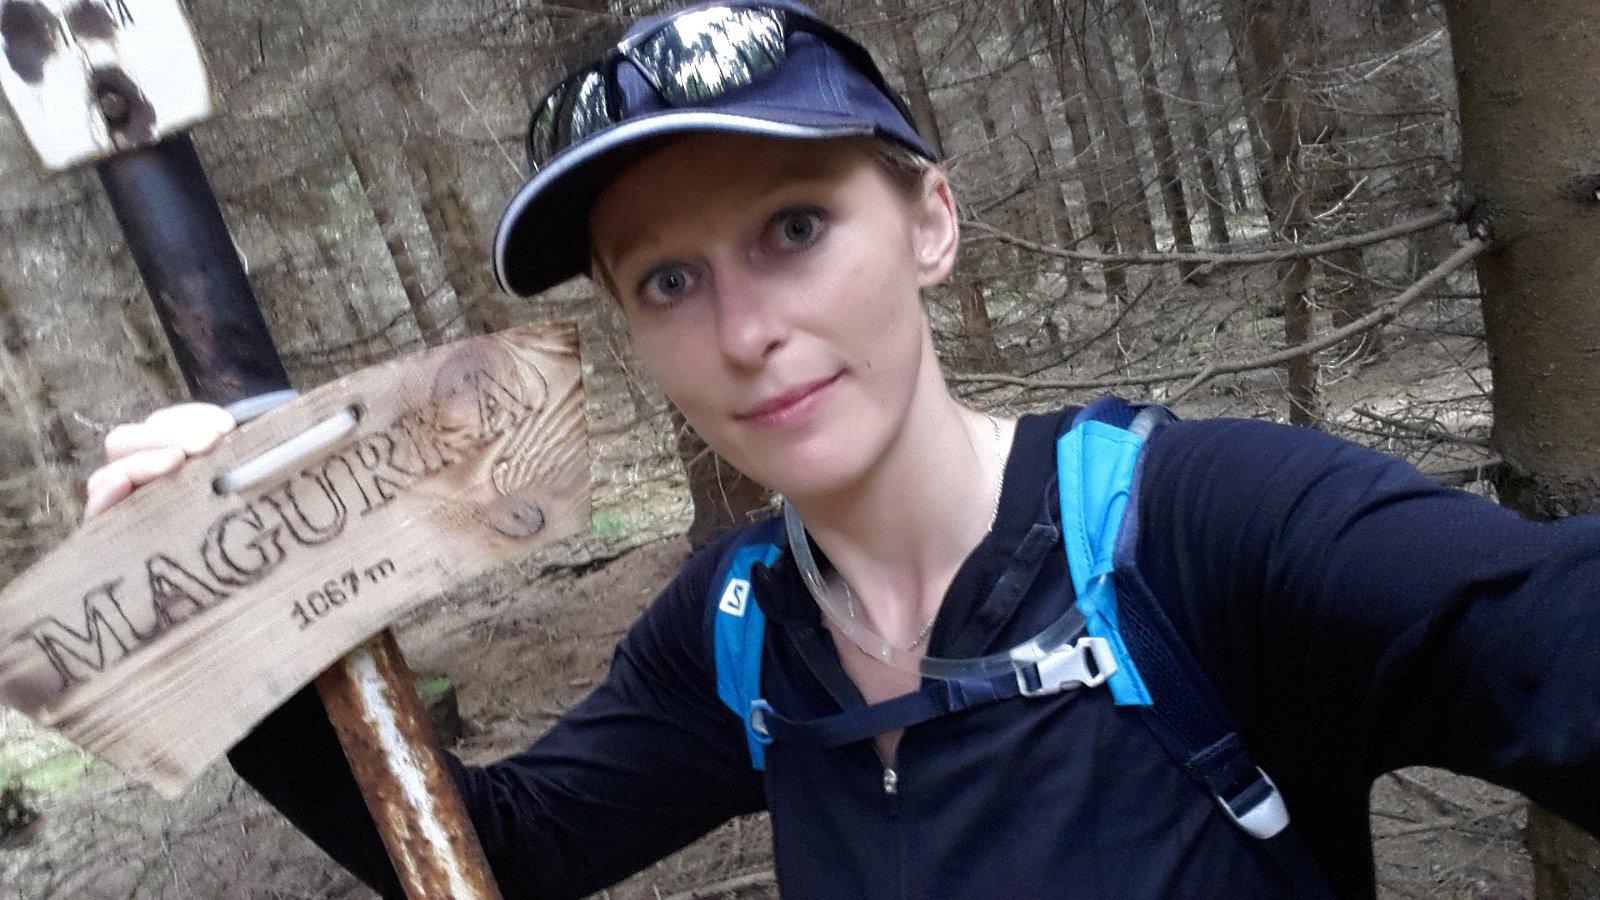 Michaela Karásková na vrcholu Magurka (29.7.2018 15:53)